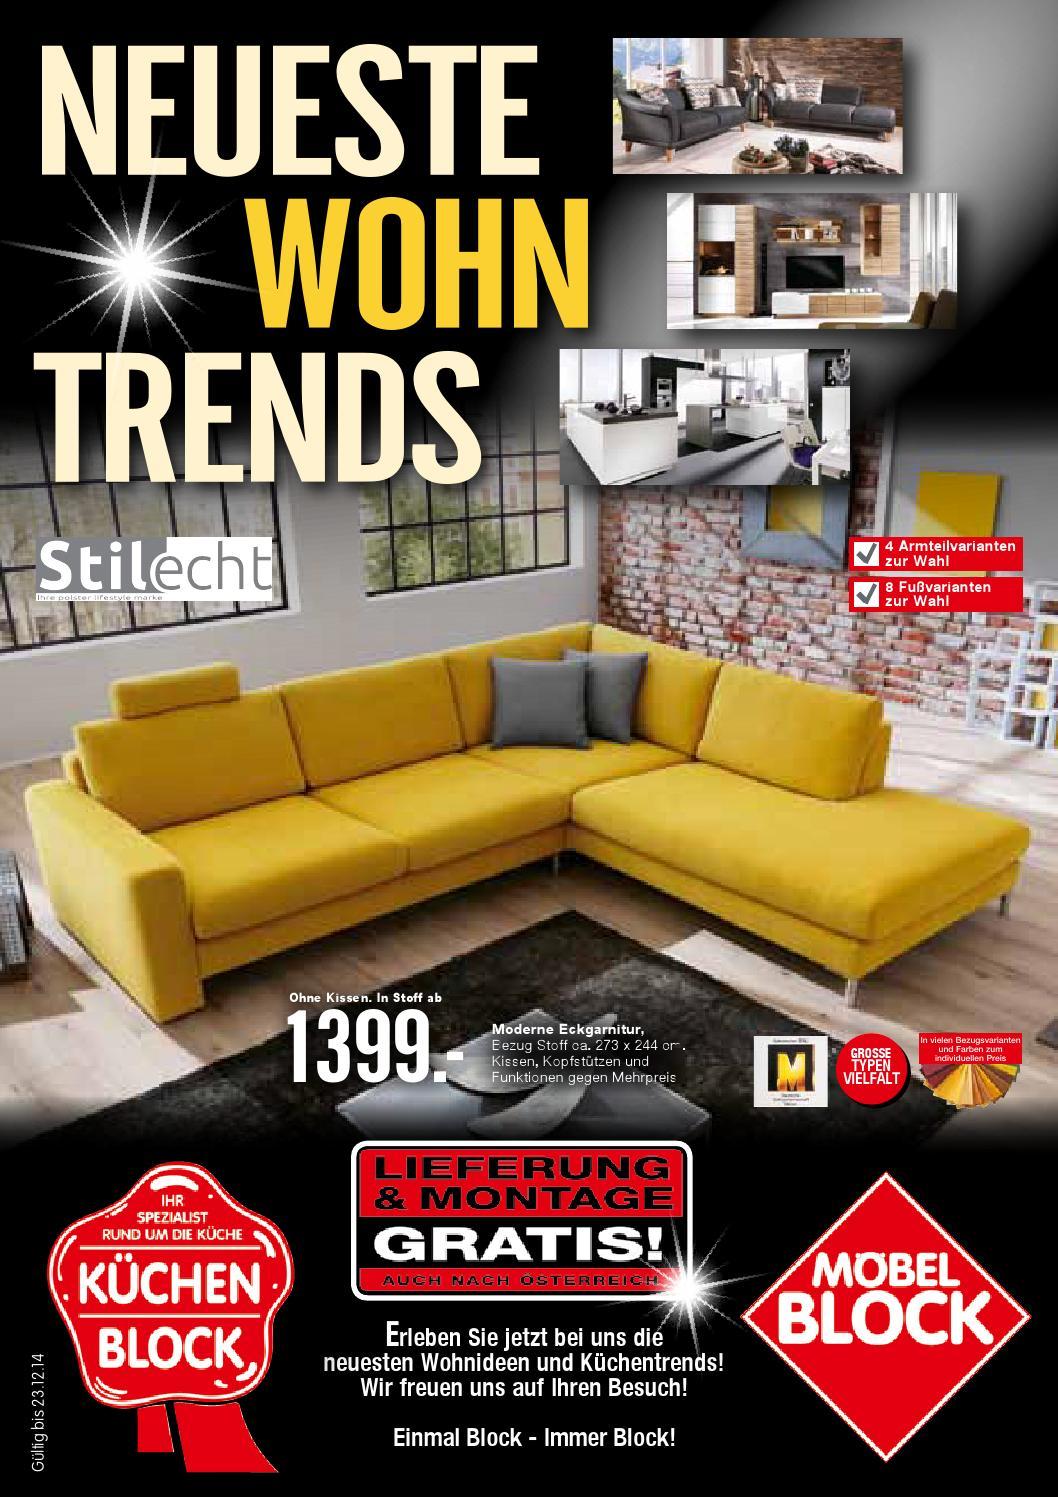 moebel block kw49 by russmedia digital gmbh issuu. Black Bedroom Furniture Sets. Home Design Ideas